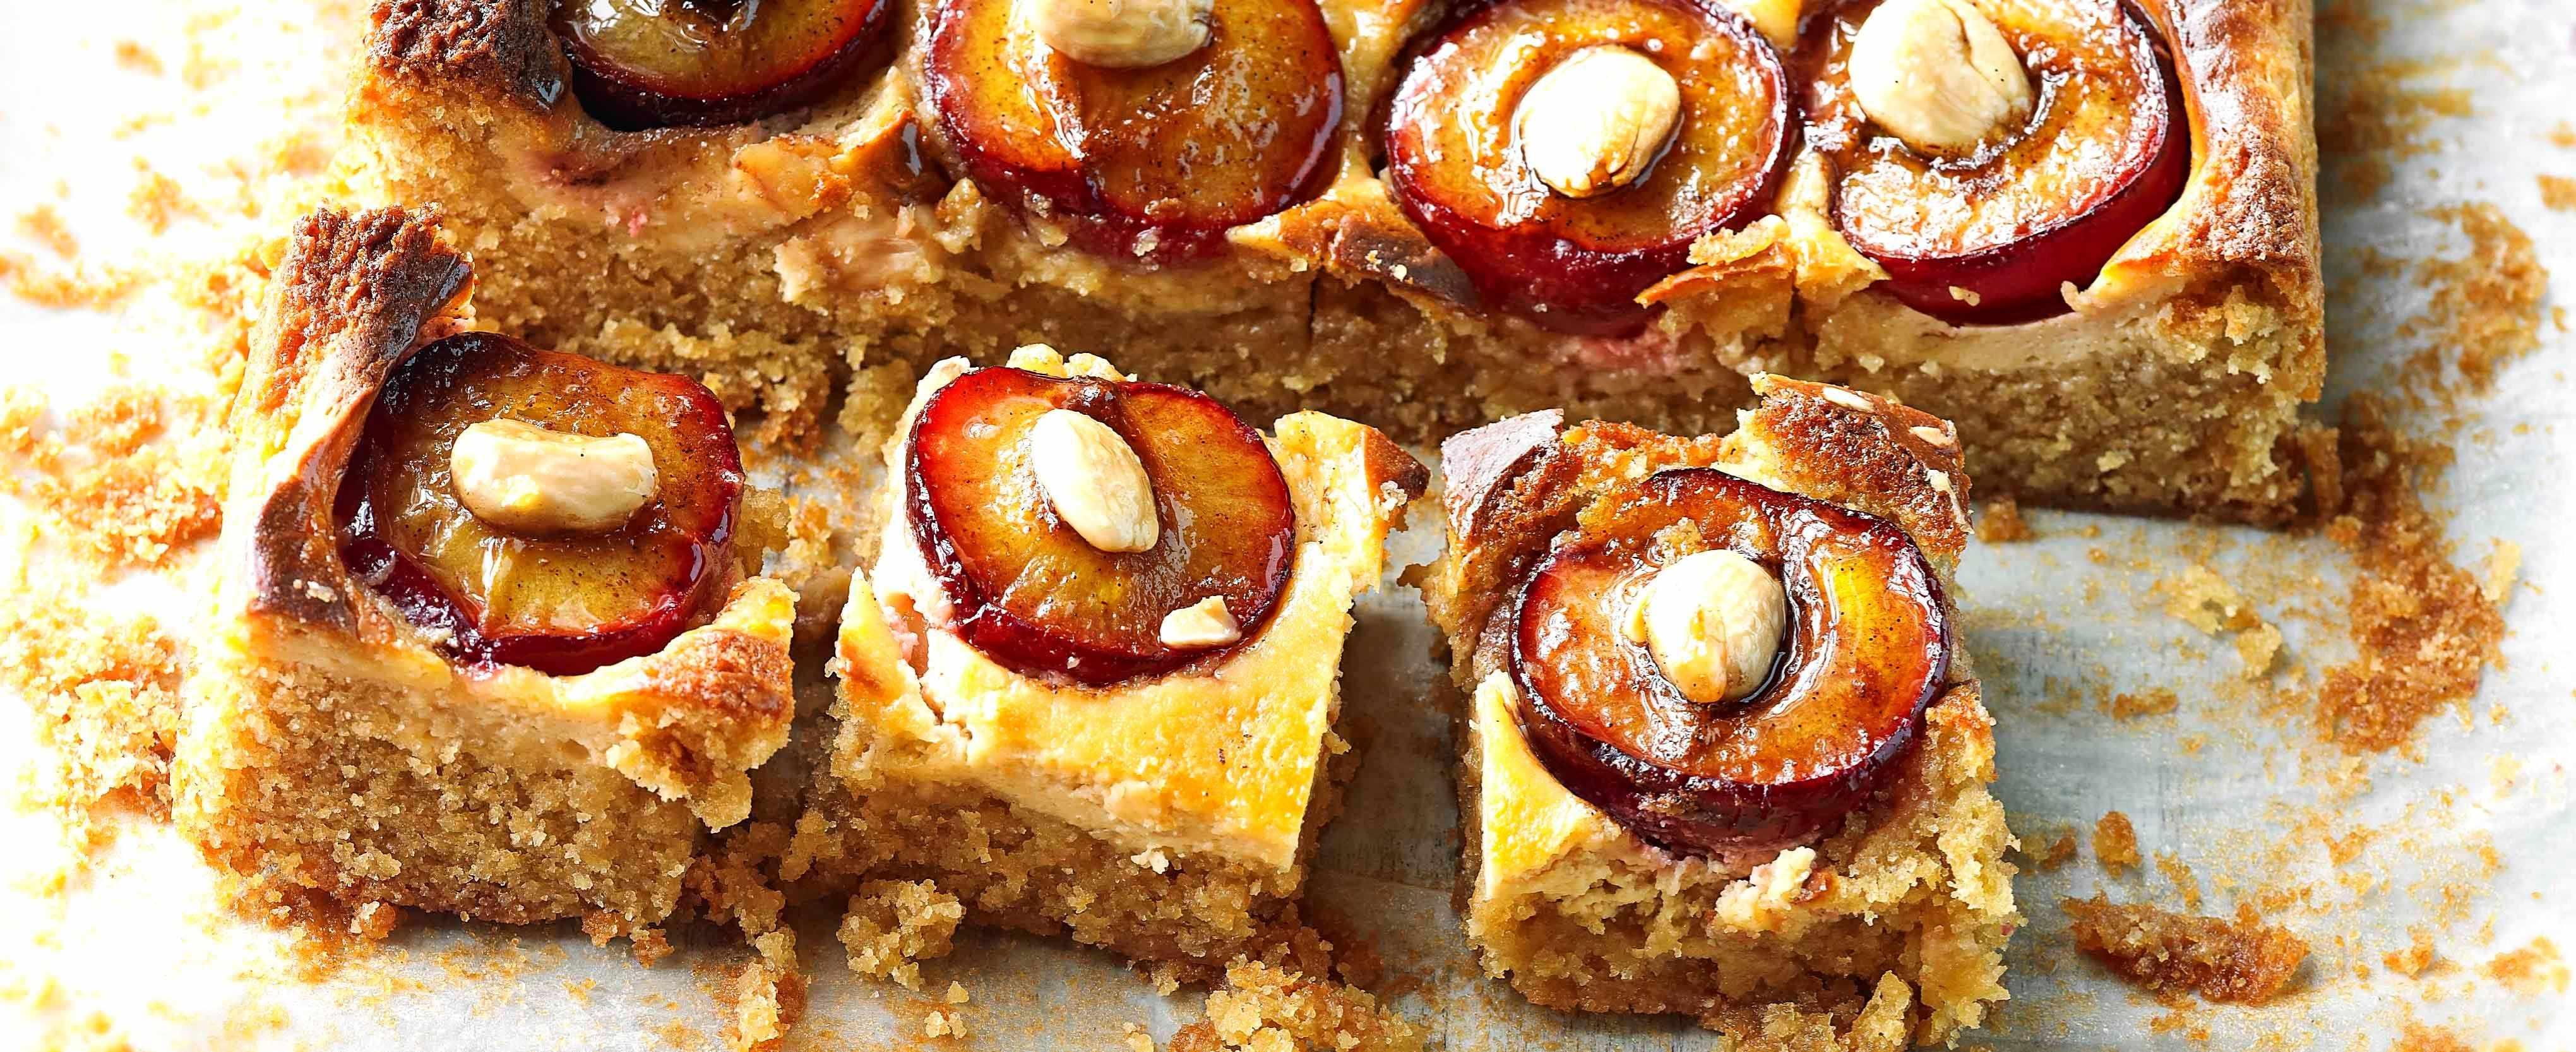 plum and almond sheet cake